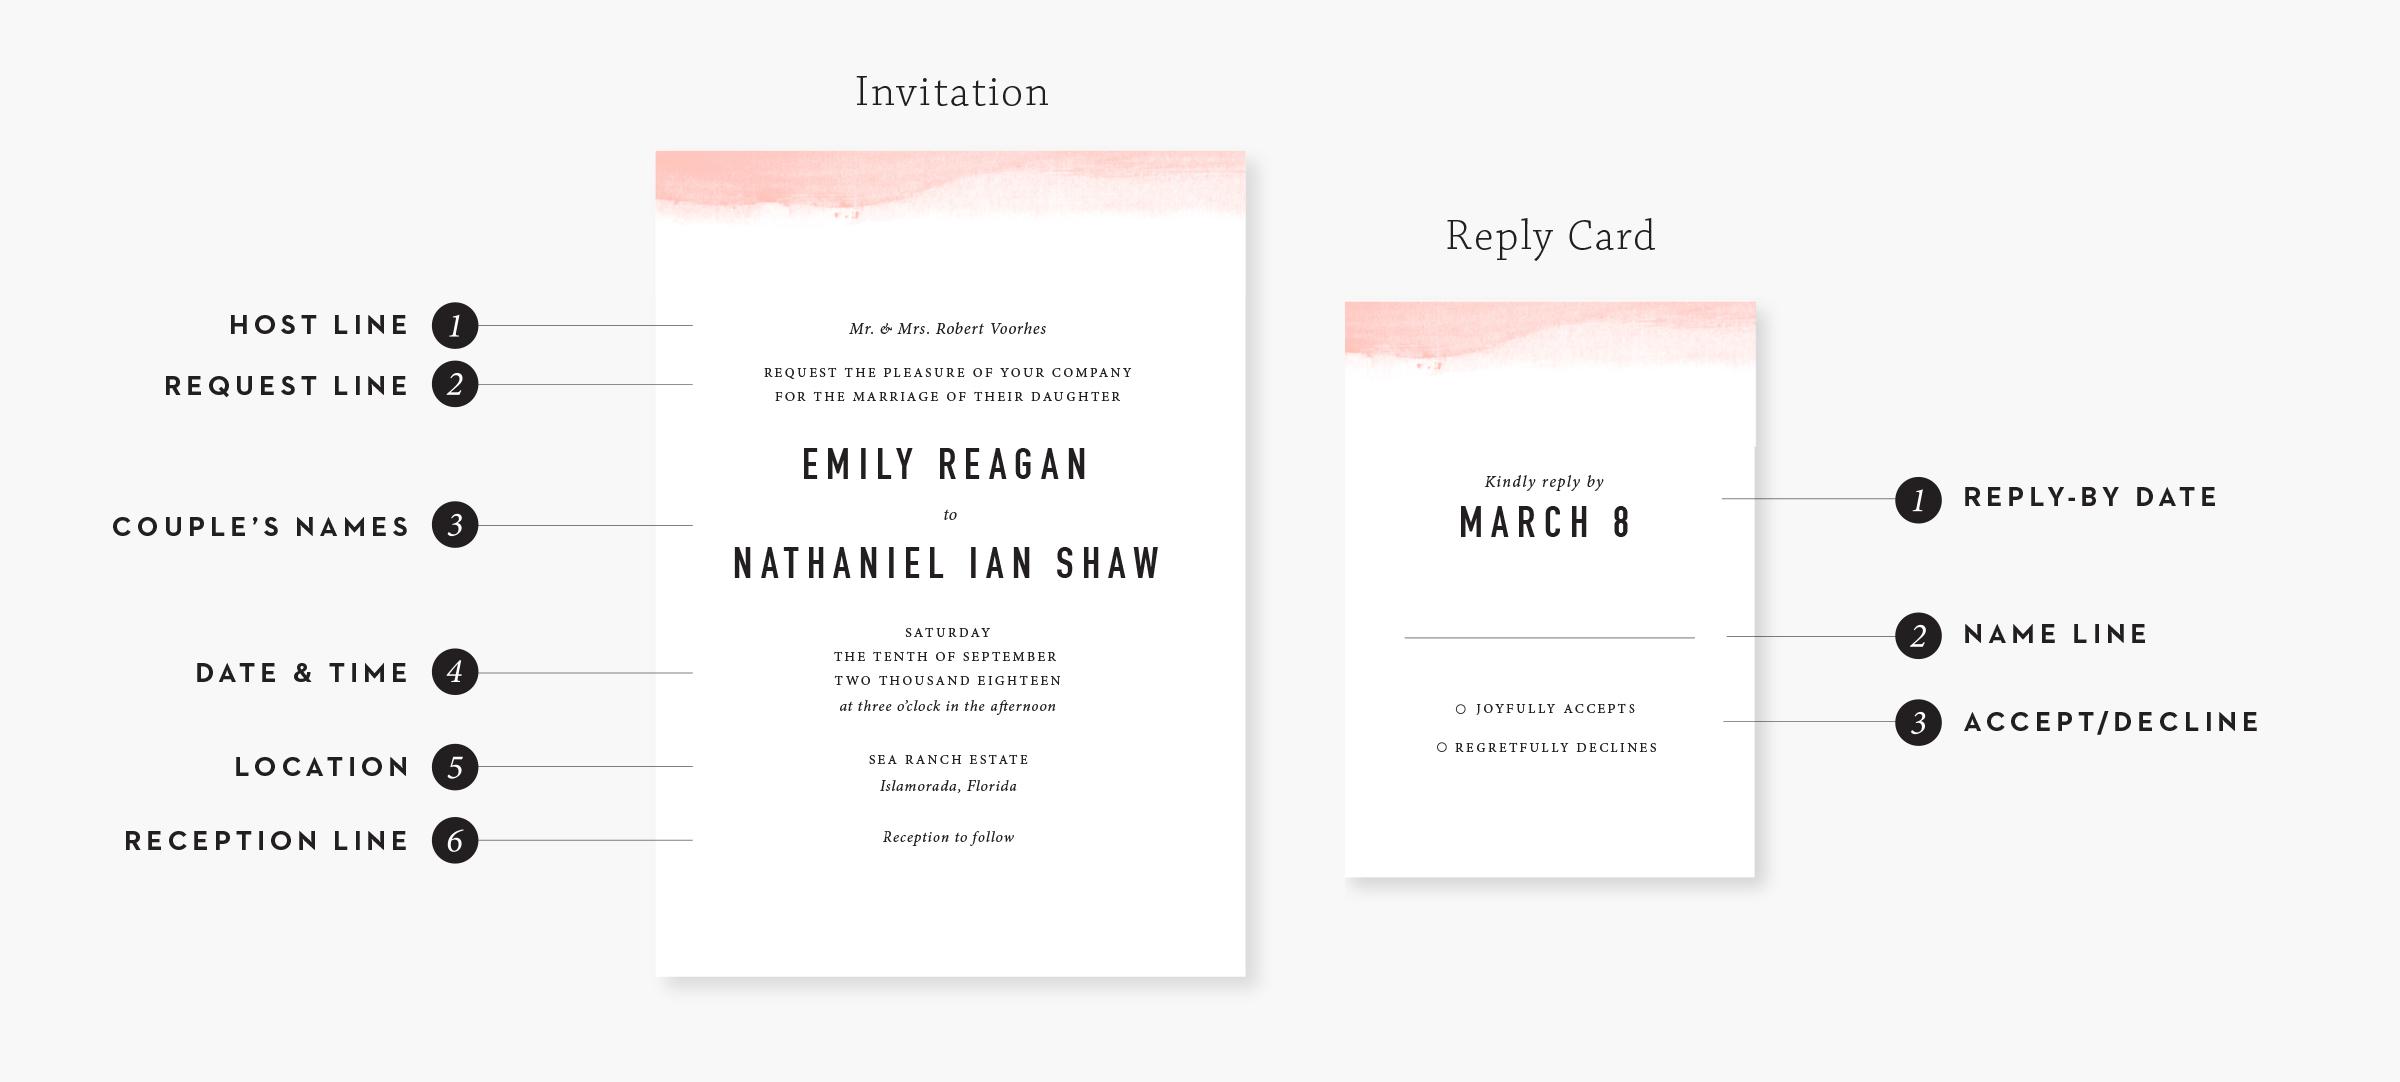 Wedding Invitation Wording and Etiquette Examples